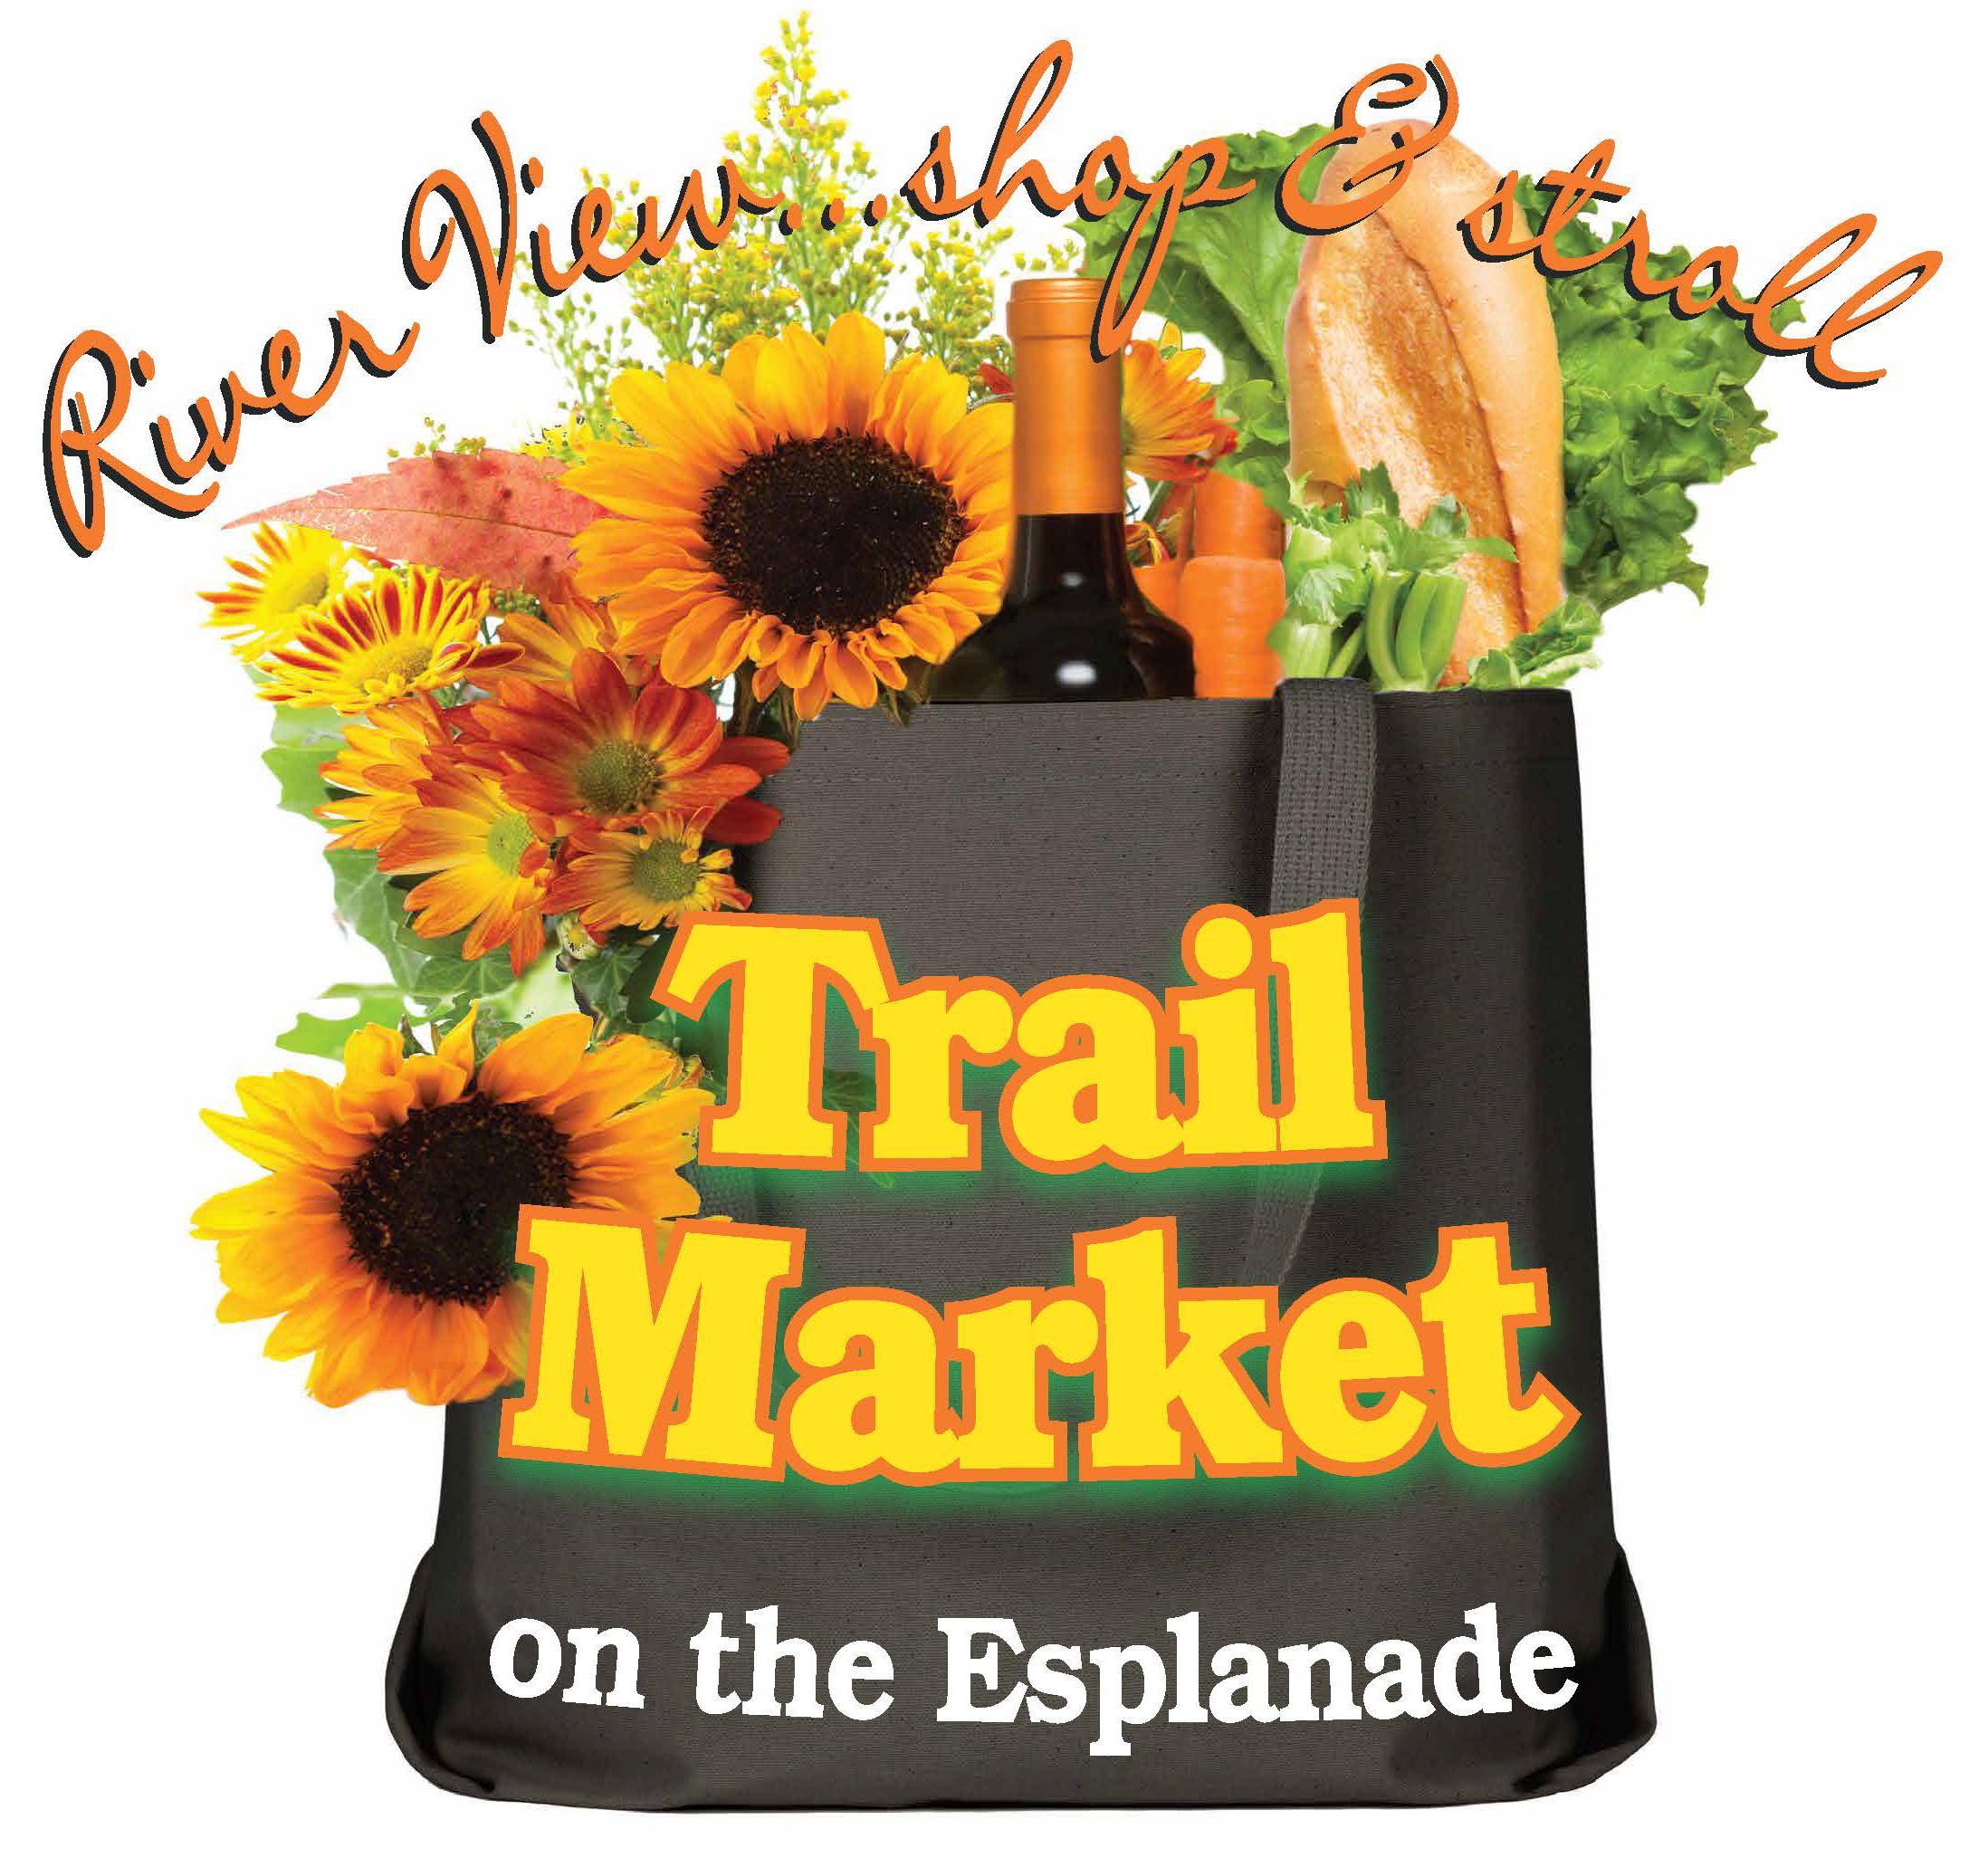 Trail Market on the Esplanade